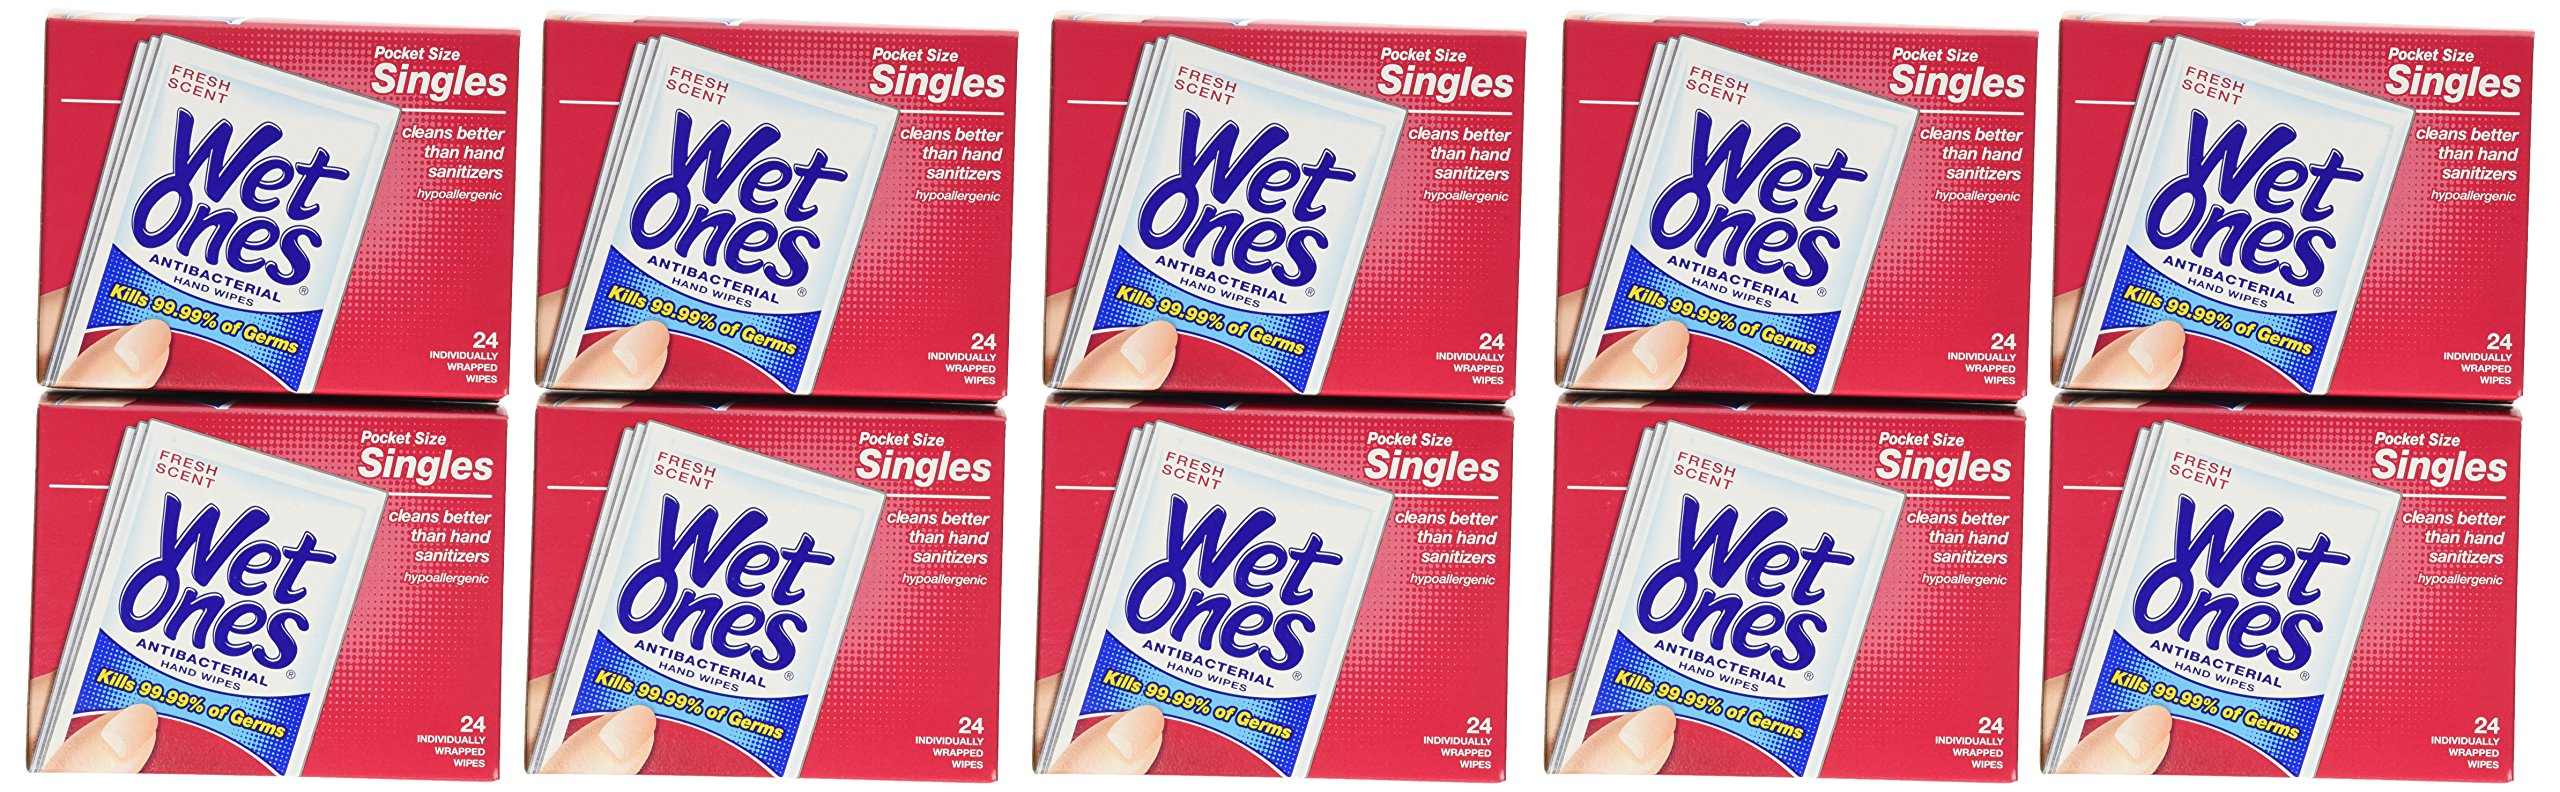 Wet Ones Antibacterial Hand Wipes Singles, (Pack of 24 X 10) by Wet Ones